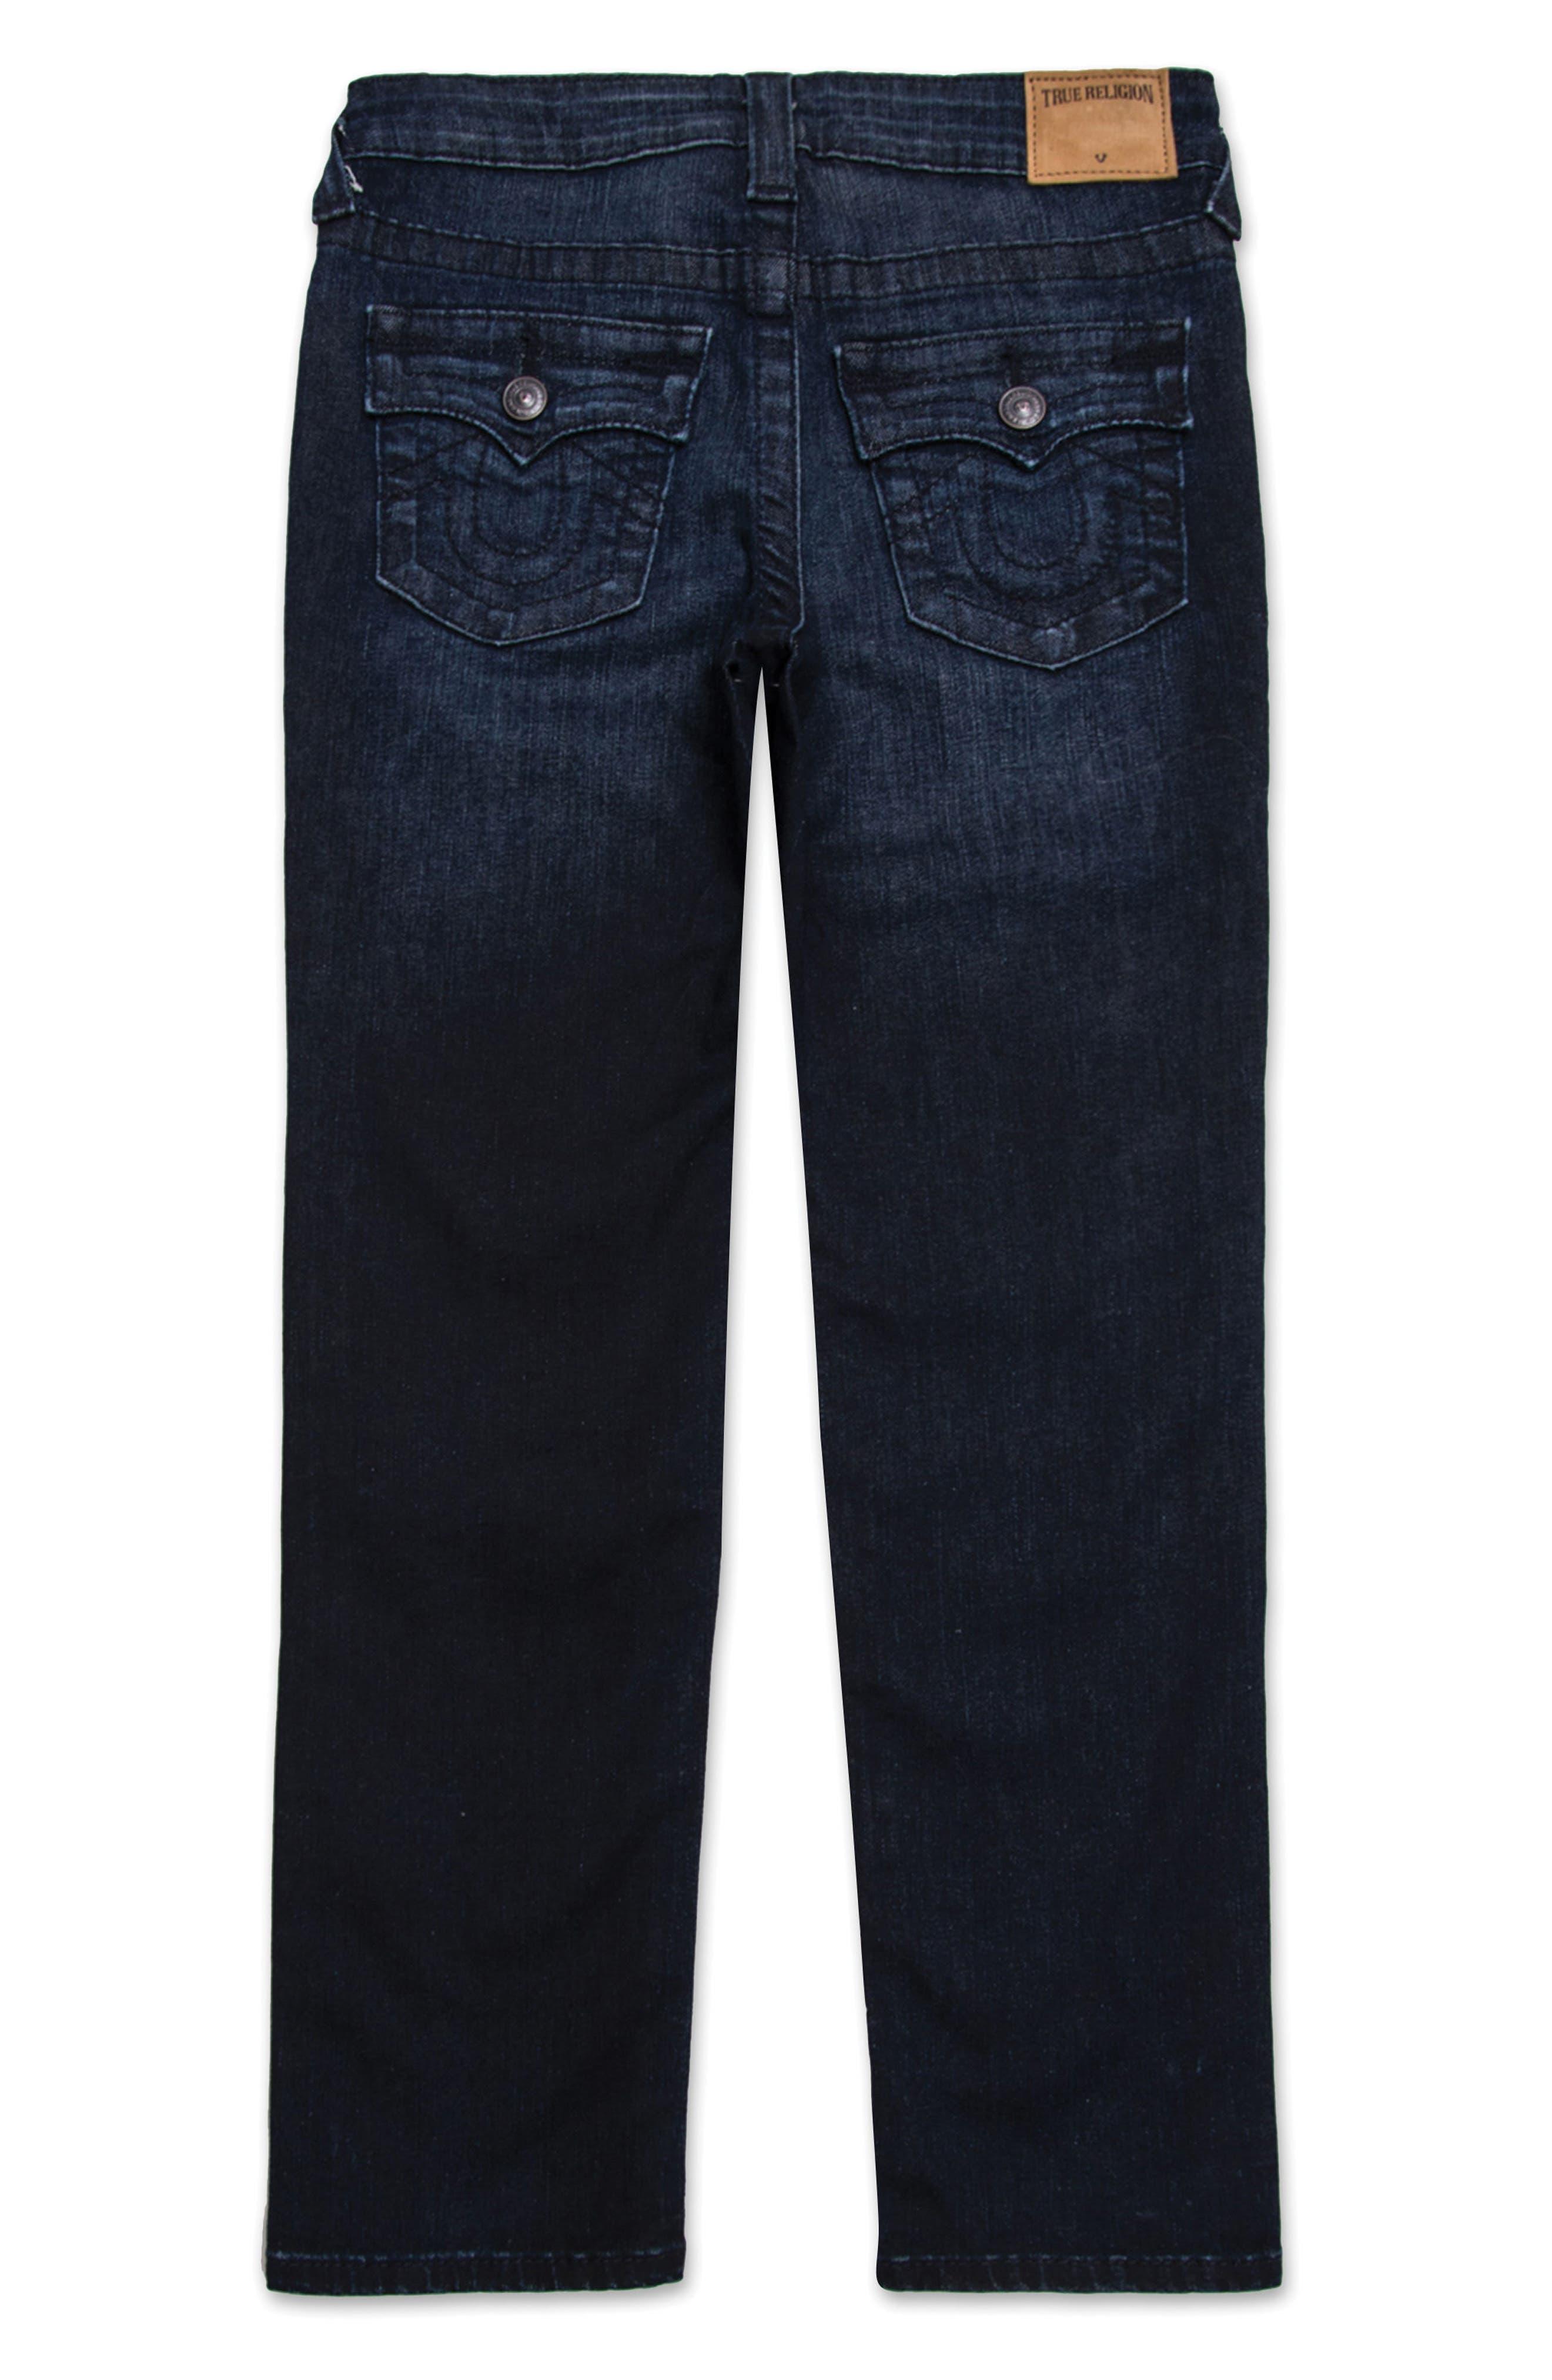 TRUE RELIGION BRAND JEANS Geno Relaxed Slim Fit Jeans, Main, color, BLUE ASPHALT WASH